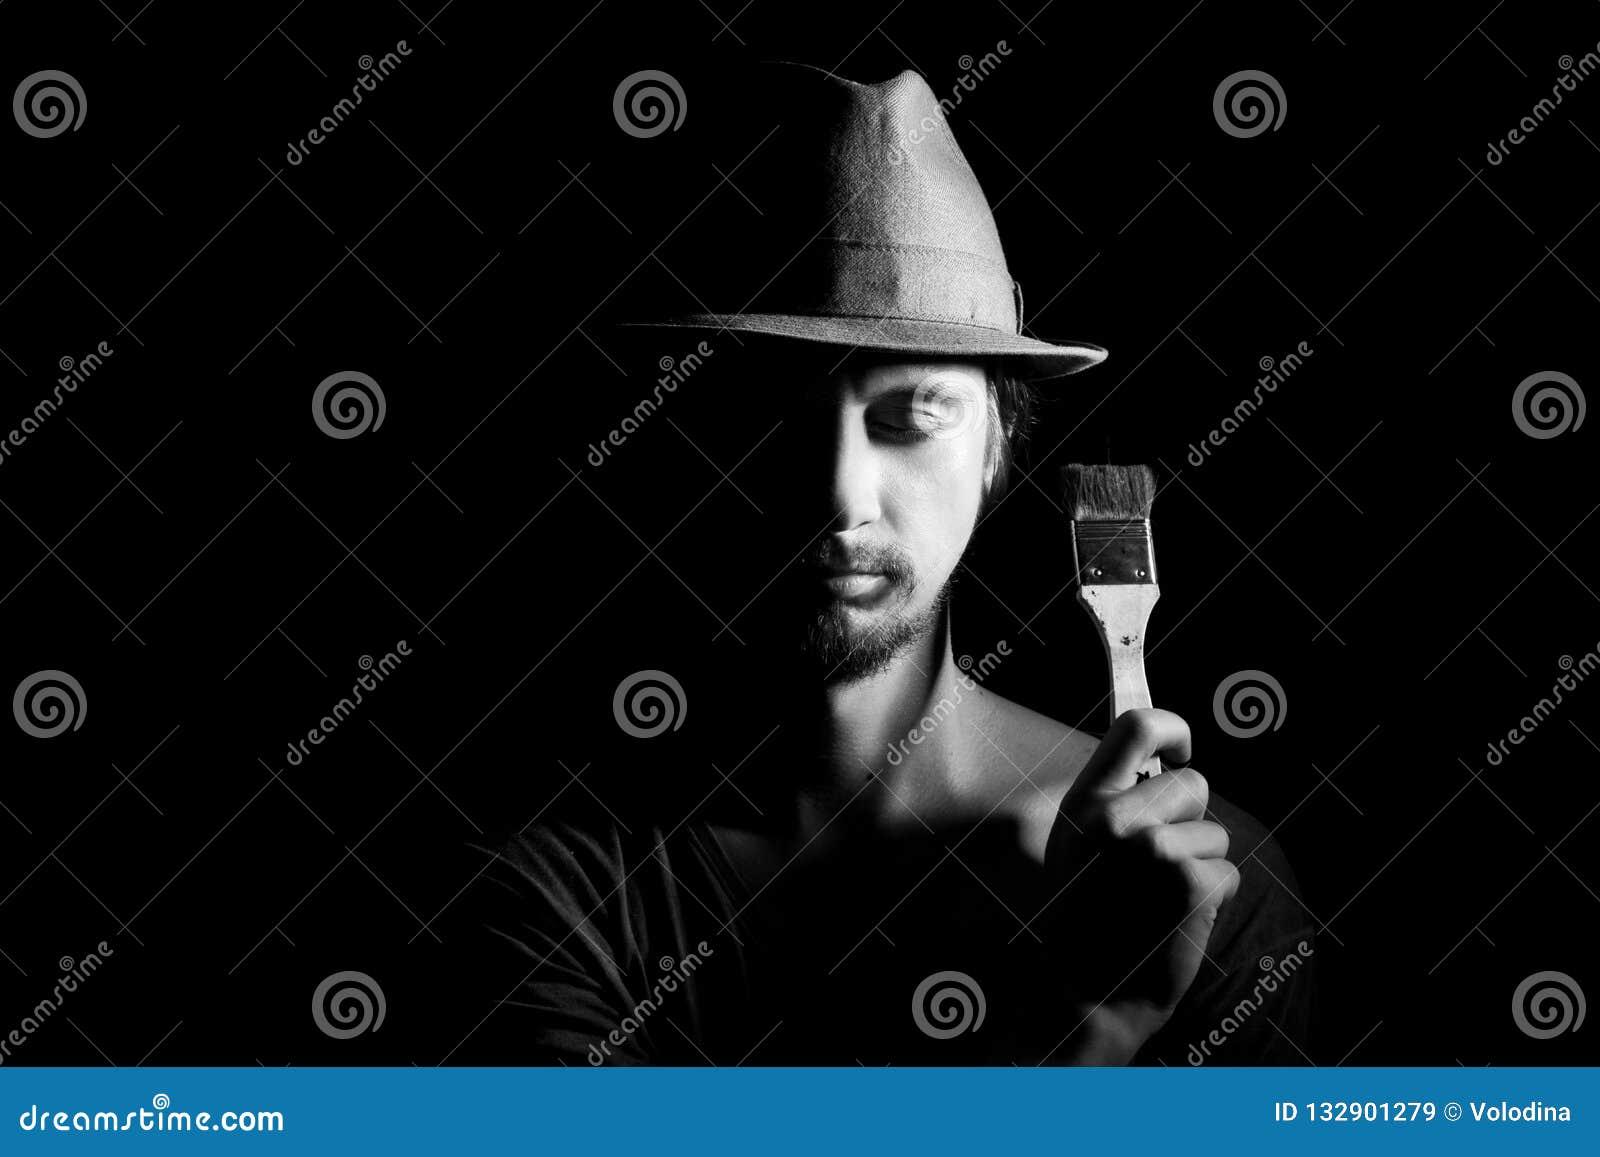 Portrait of artist-man with hat